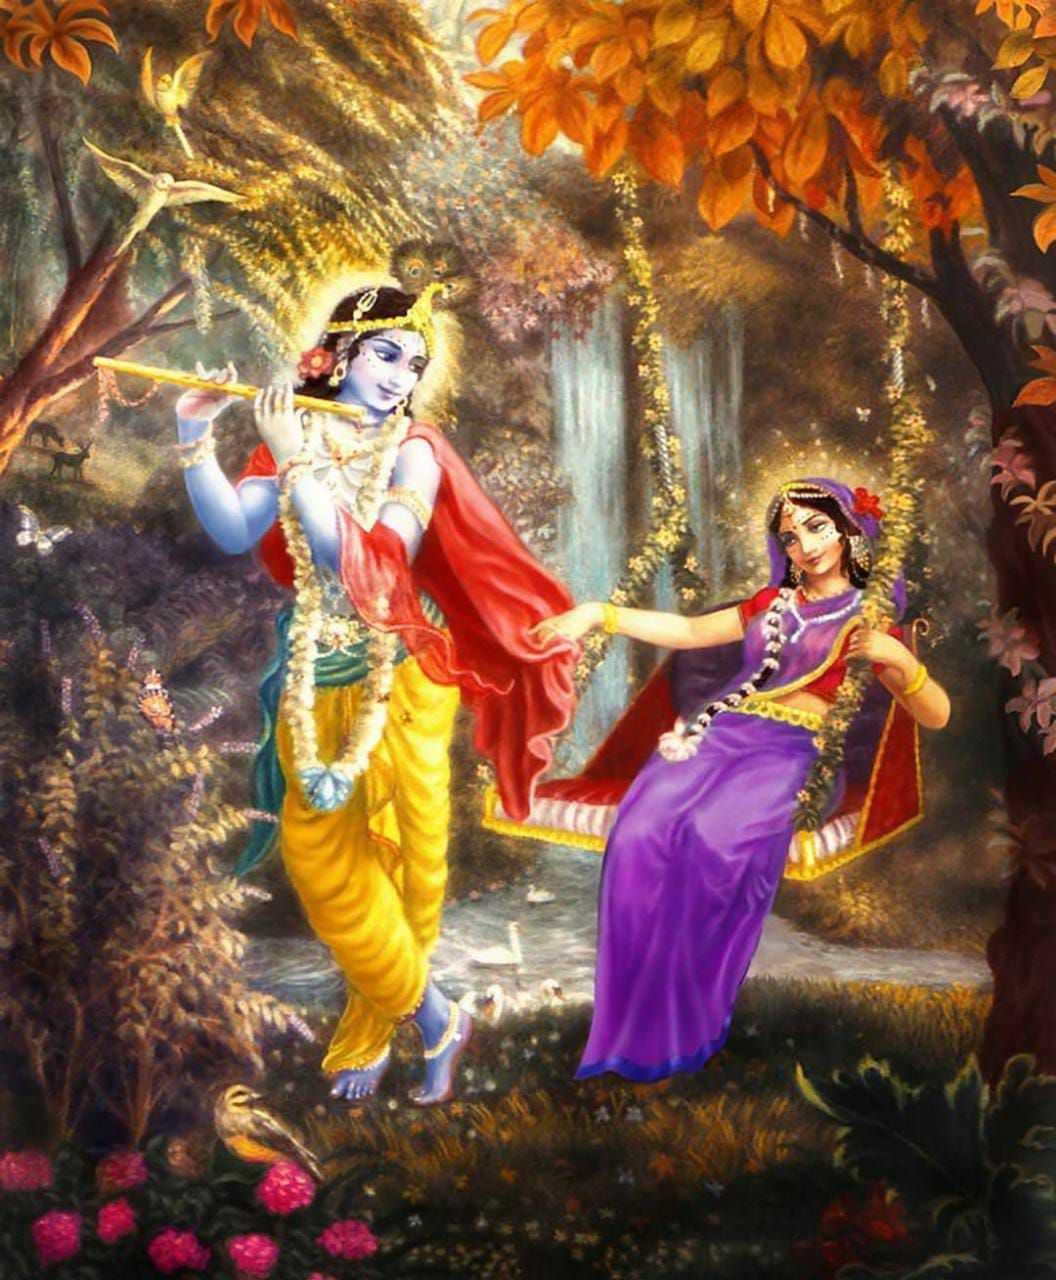 Jai Krishna Kanhaiya Fresh Wallpaper HD Quality - beautiful Krishna love wallpaper with goddess radha rani, Images of lord krishna and radha in love, Most beautiful shree krishna images & wallpapers of radha rani.